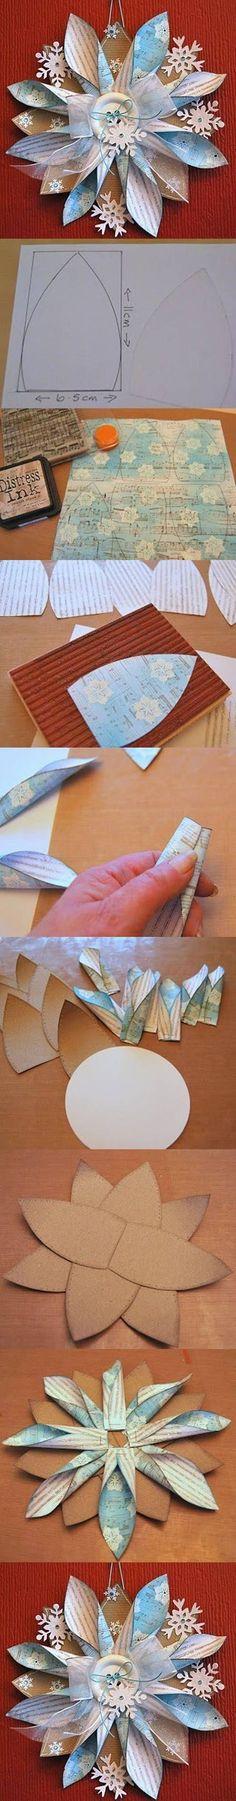 Beautiful Paper Decoration | DIY & Crafts (try diy fun)